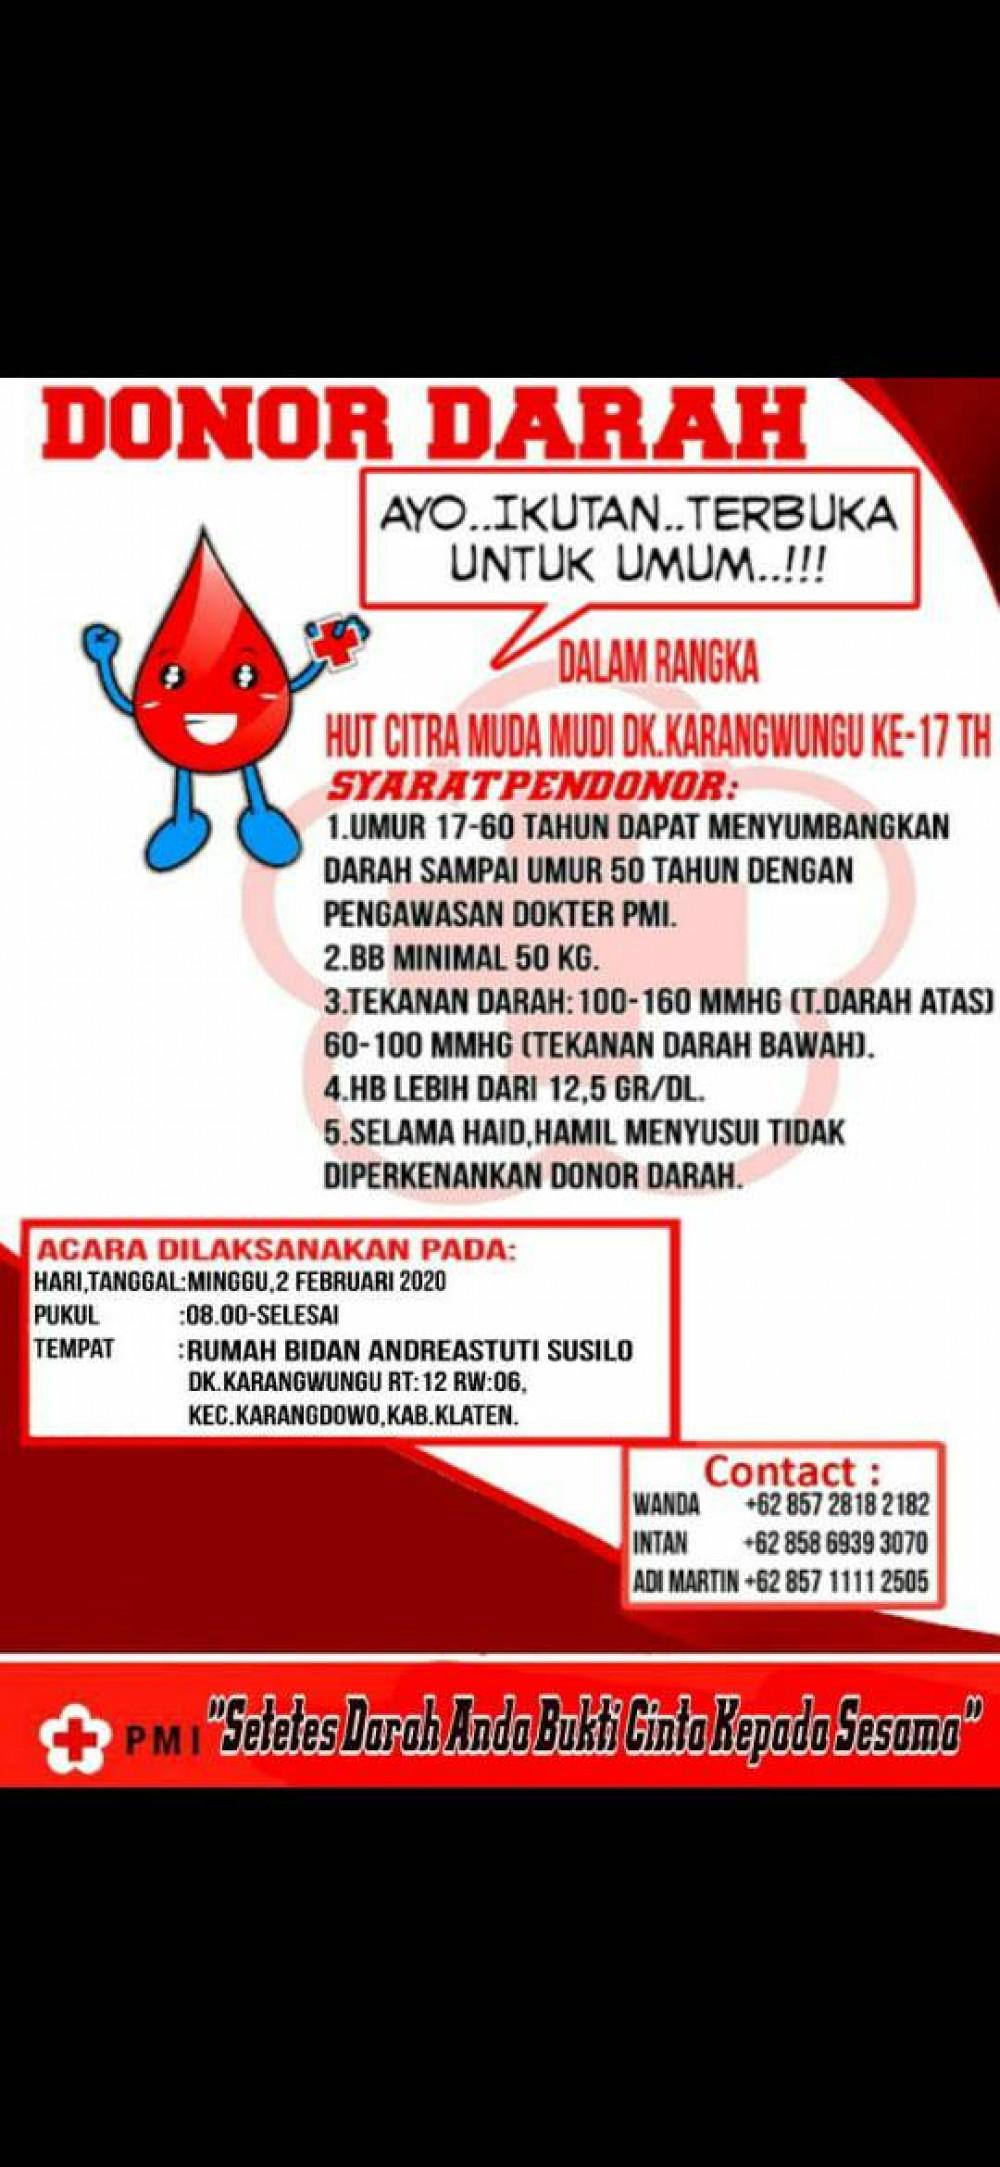 Donor Darah Karangdowo, Klaten